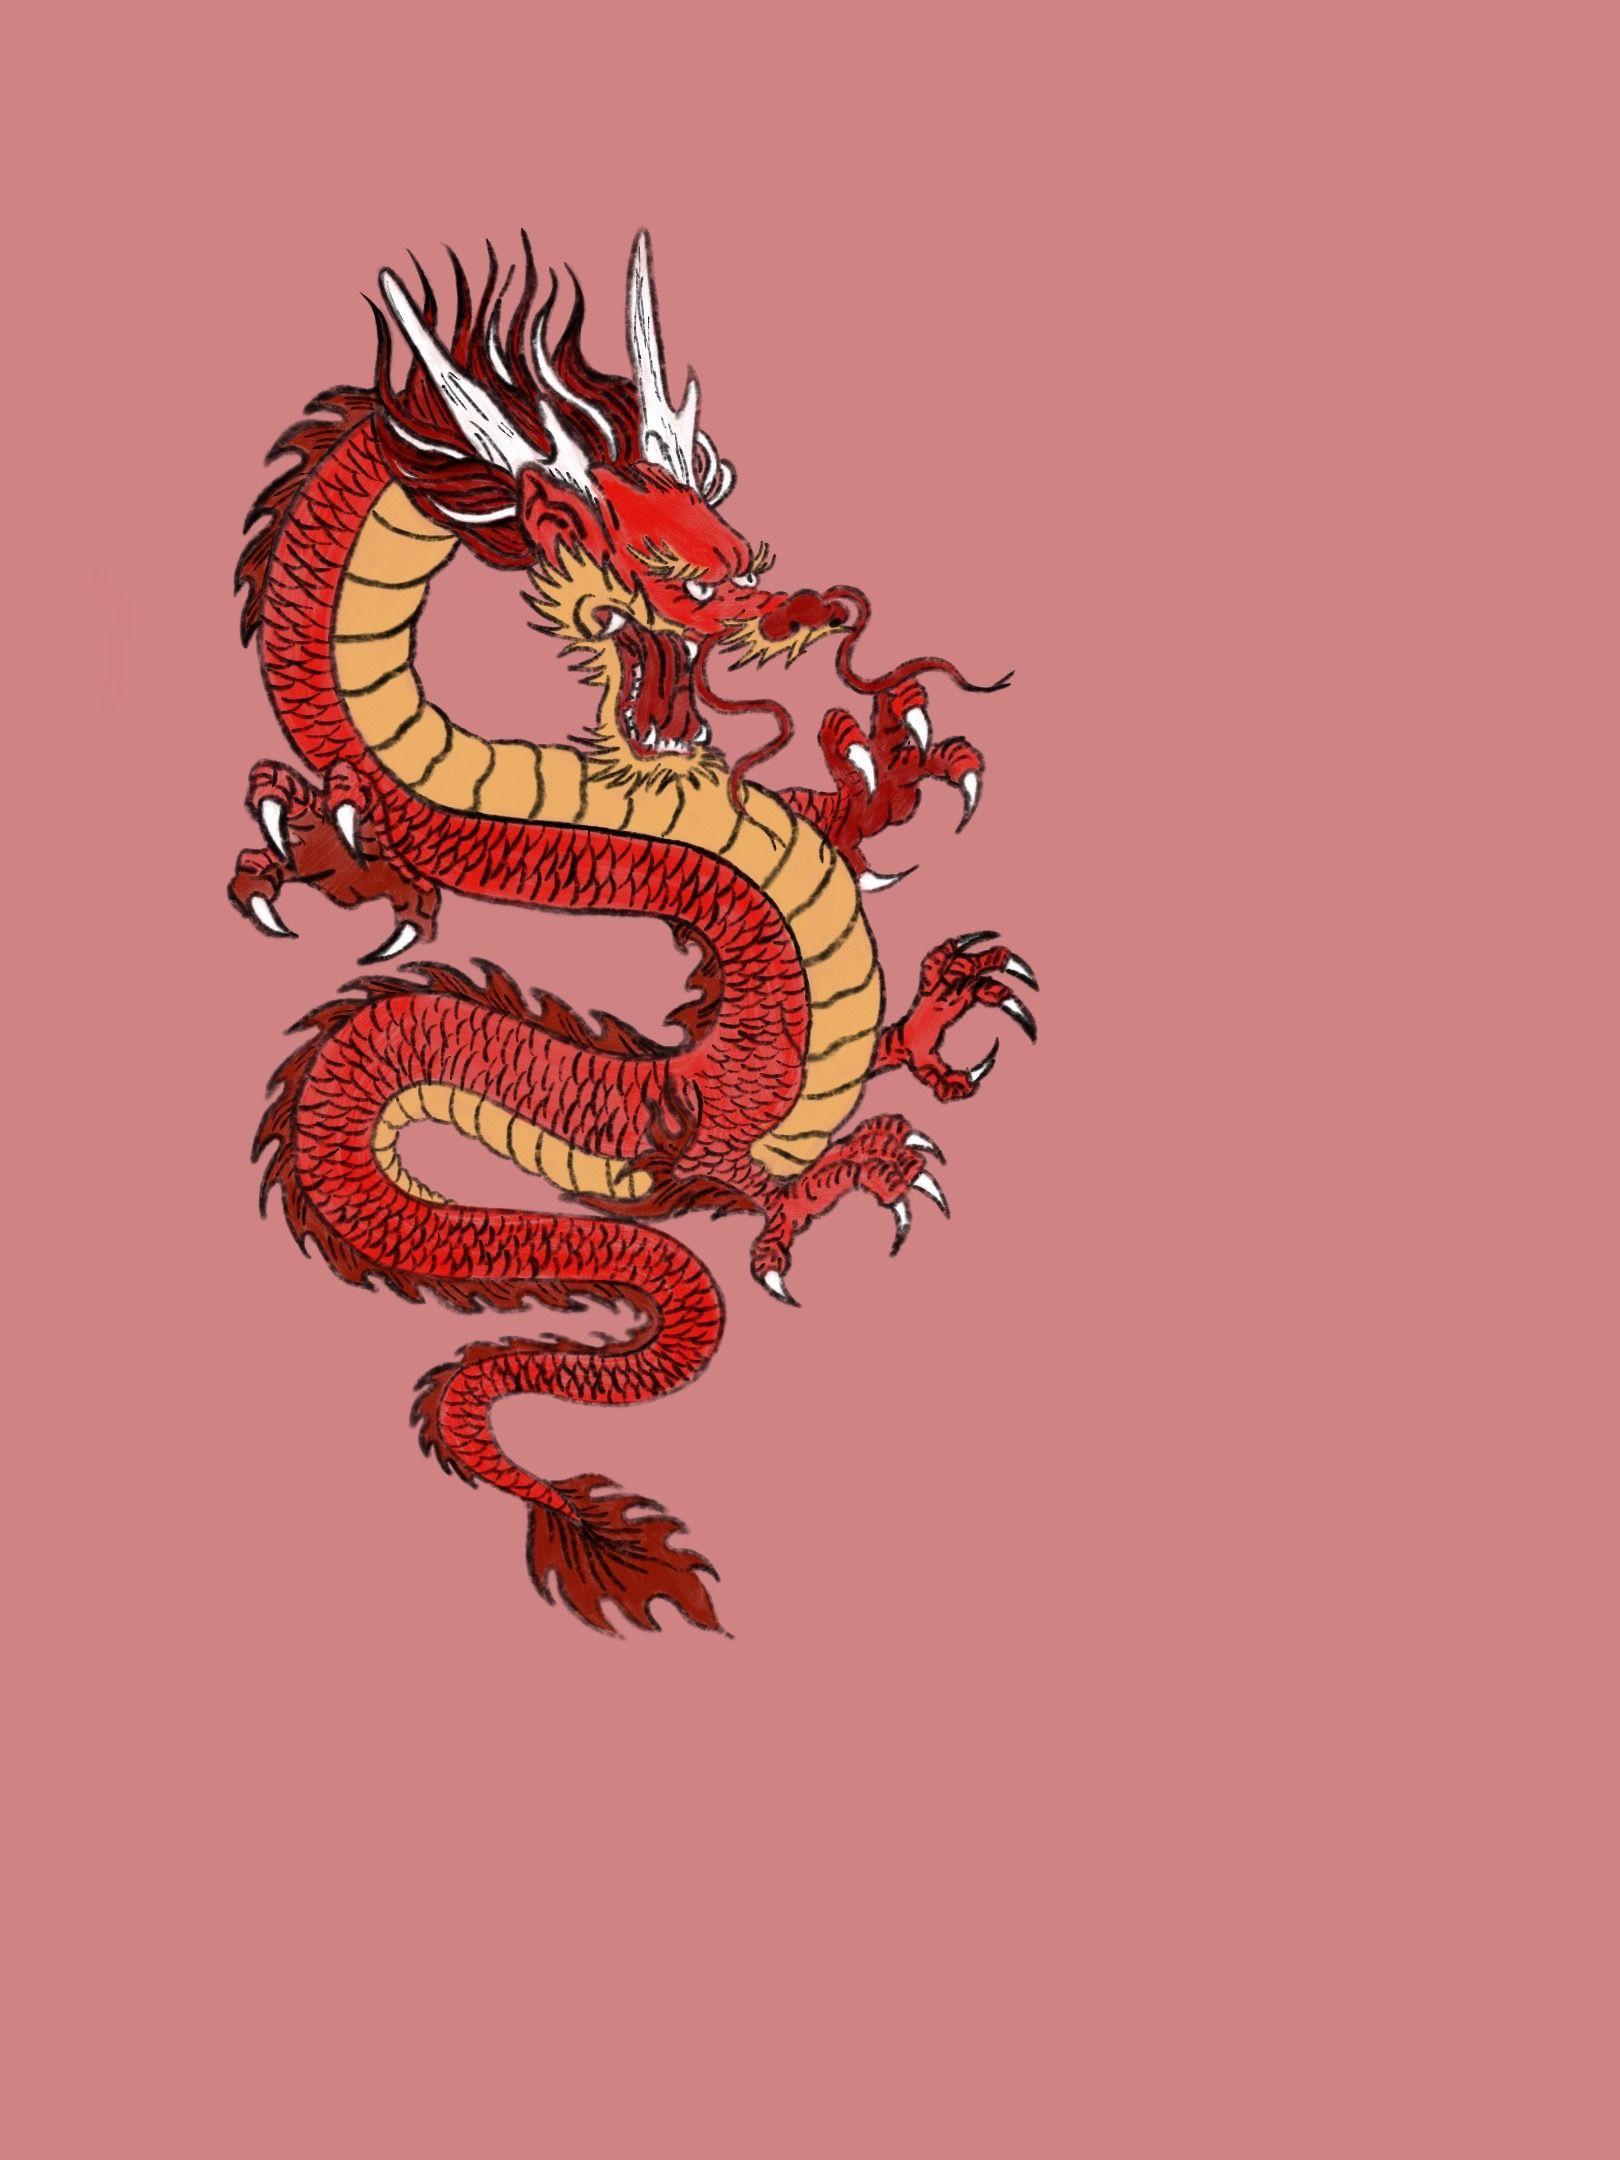 Artwork japanese dragon in 2020 Japanese dragon, Dragon